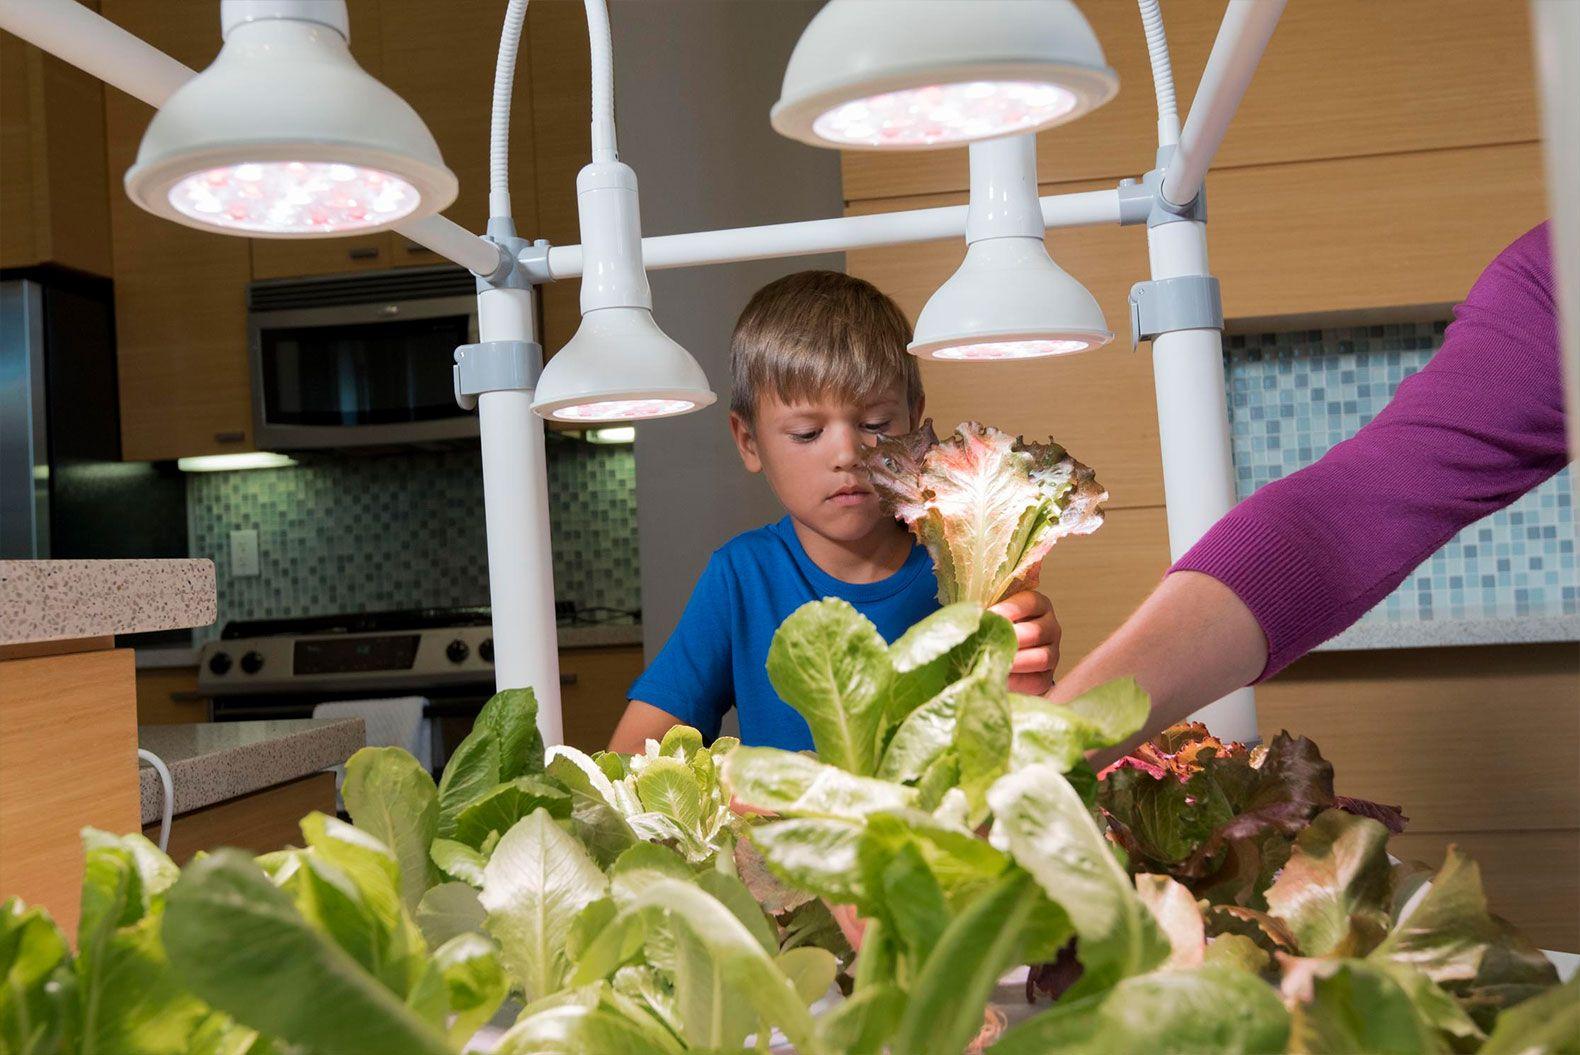 Harvest fresh veggies all year round with the energy efficient growbox grow box opcom hydroponic garden indoor garden indoor gardening kit workwithnaturefo